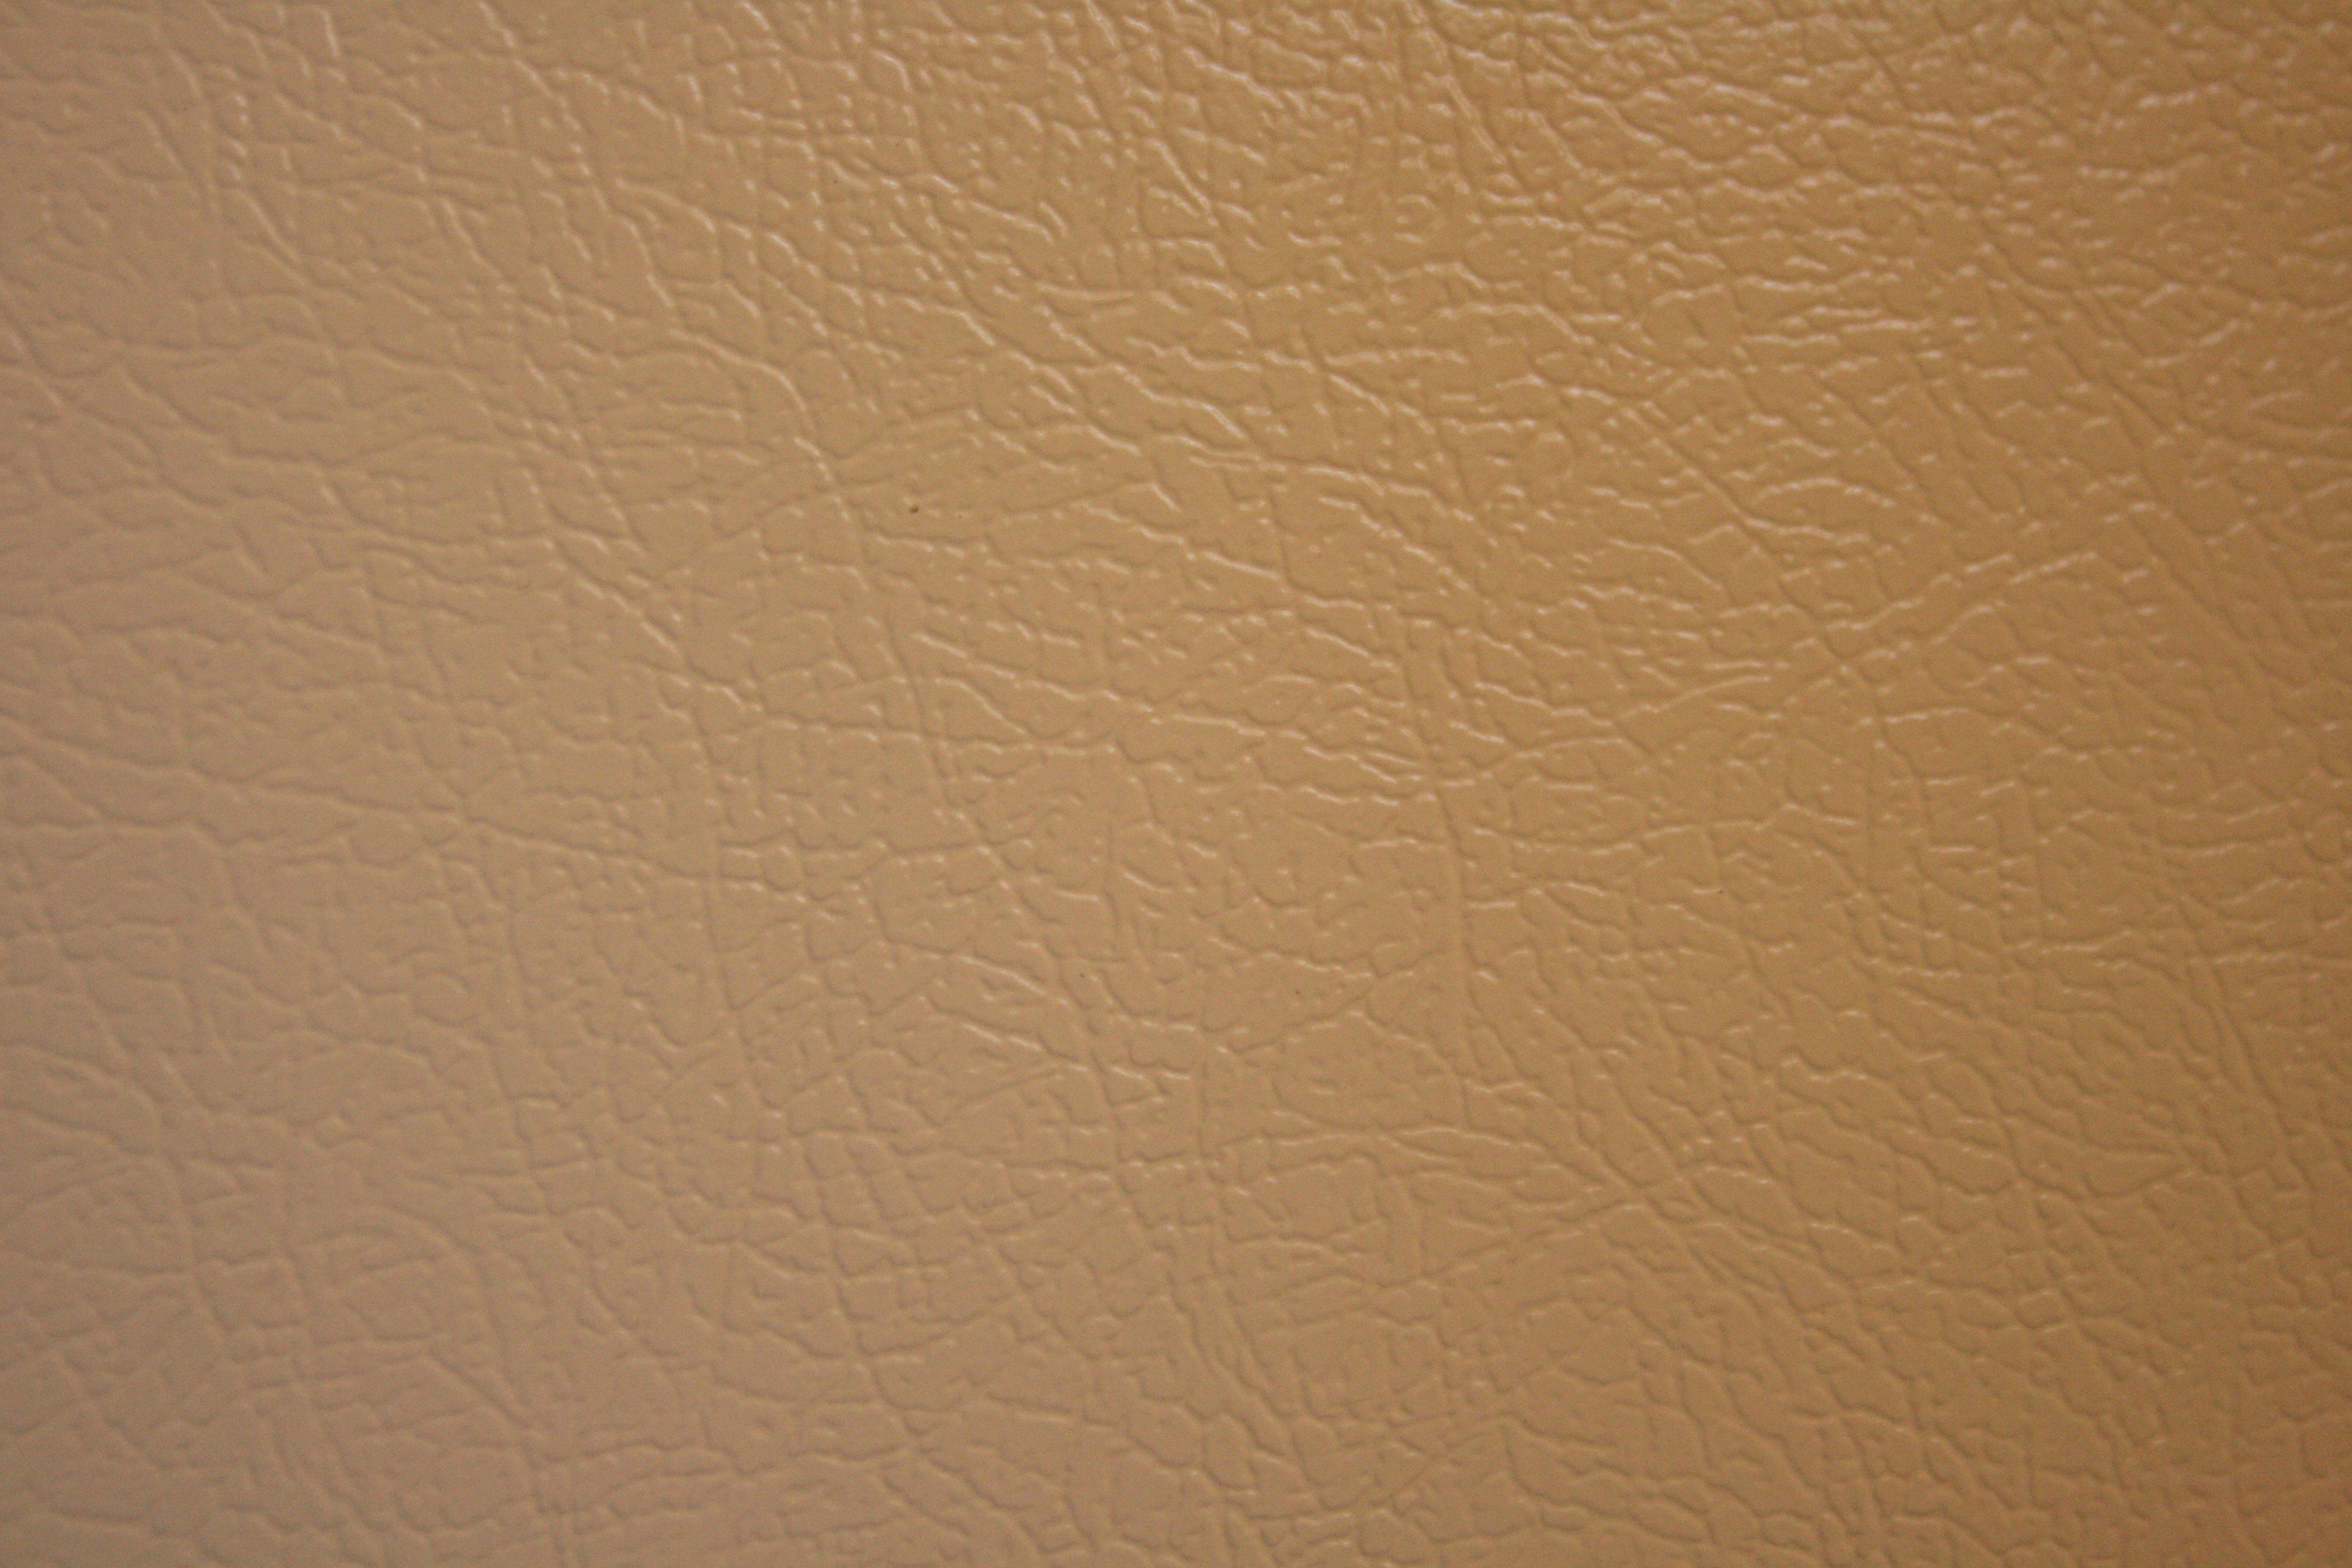 wood leather wallpaper wallpapersafari. Black Bedroom Furniture Sets. Home Design Ideas